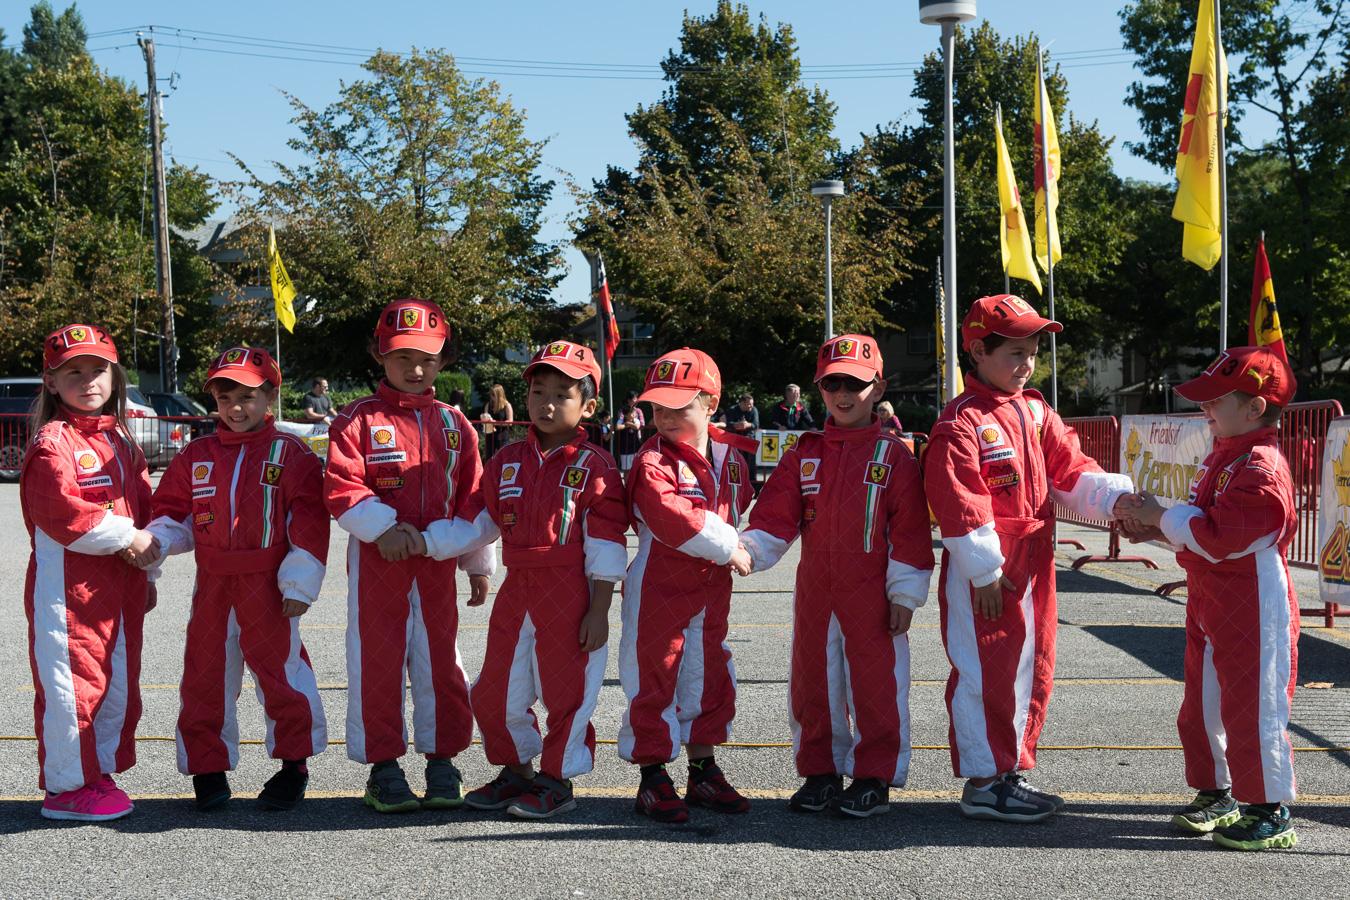 MONTECRISTO Blog: Friends of Ferrari